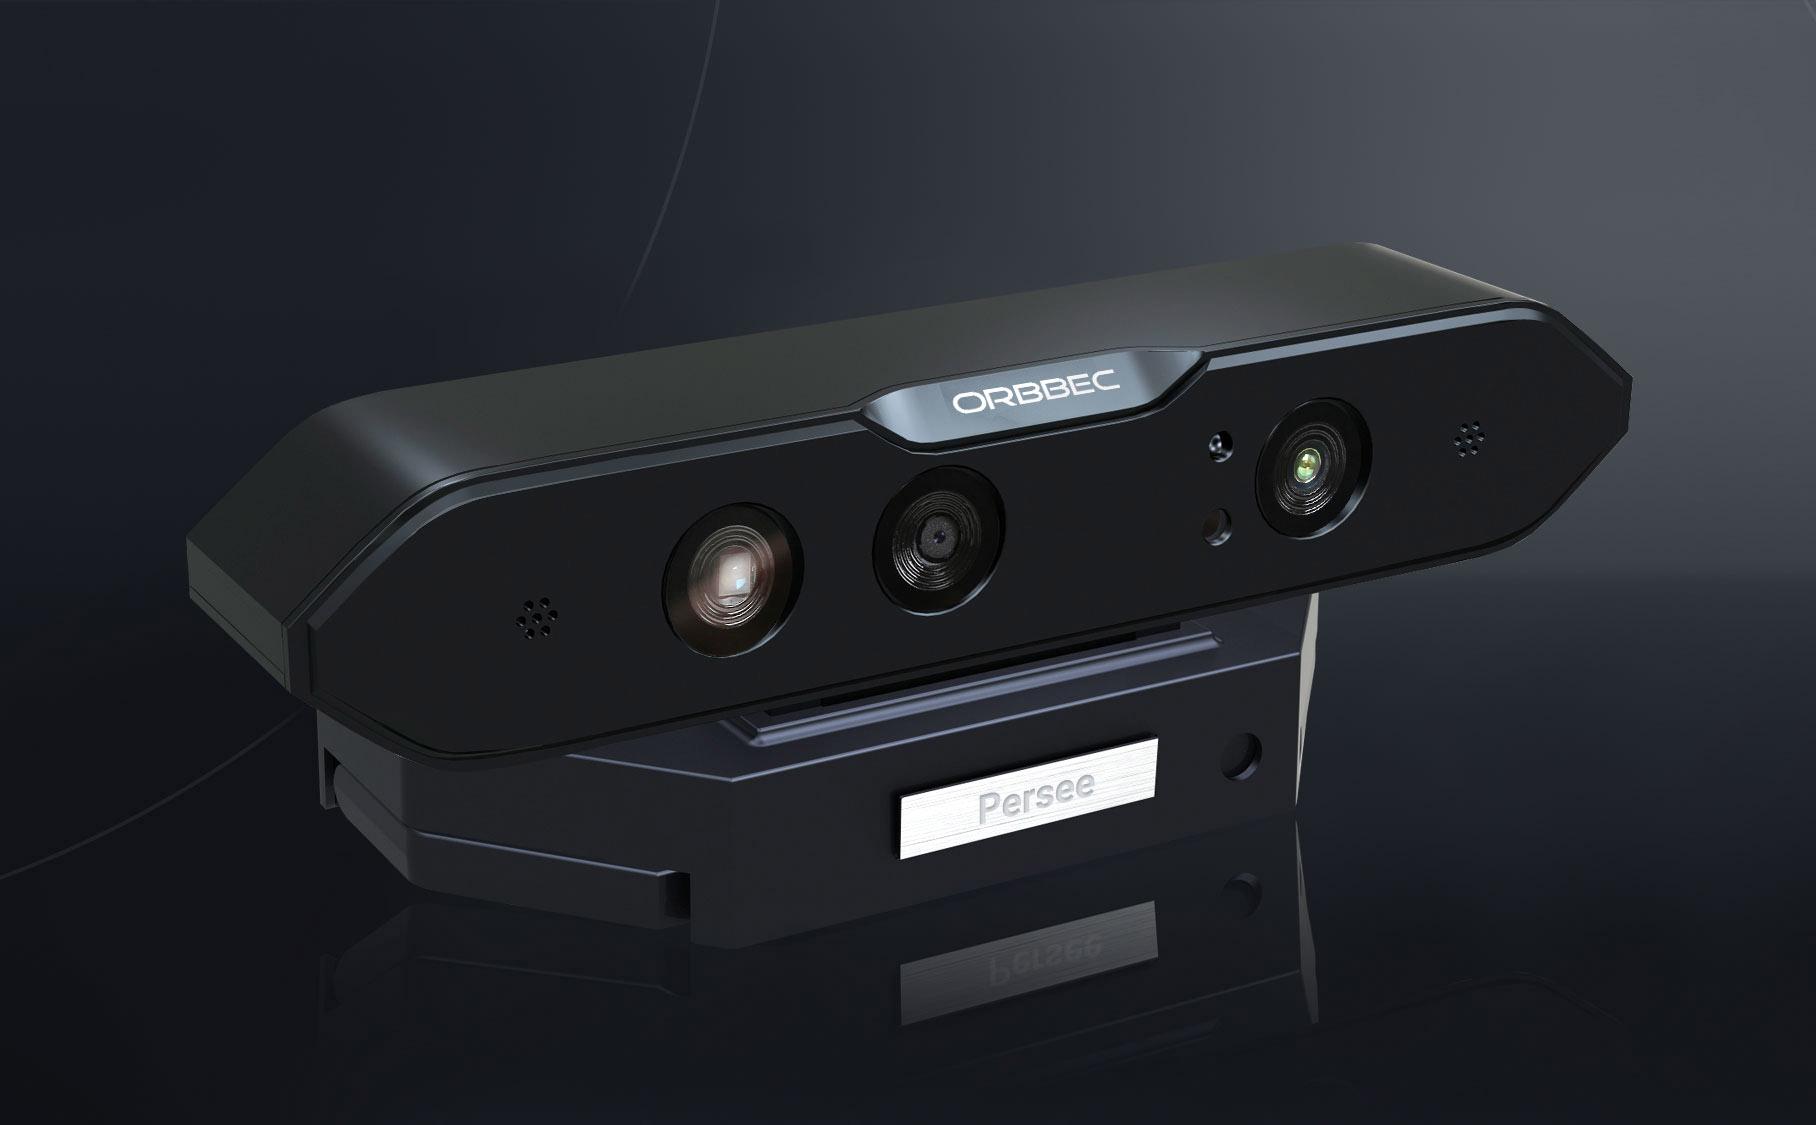 Orbbec now offers skeletal tracking: markerless full body VR is